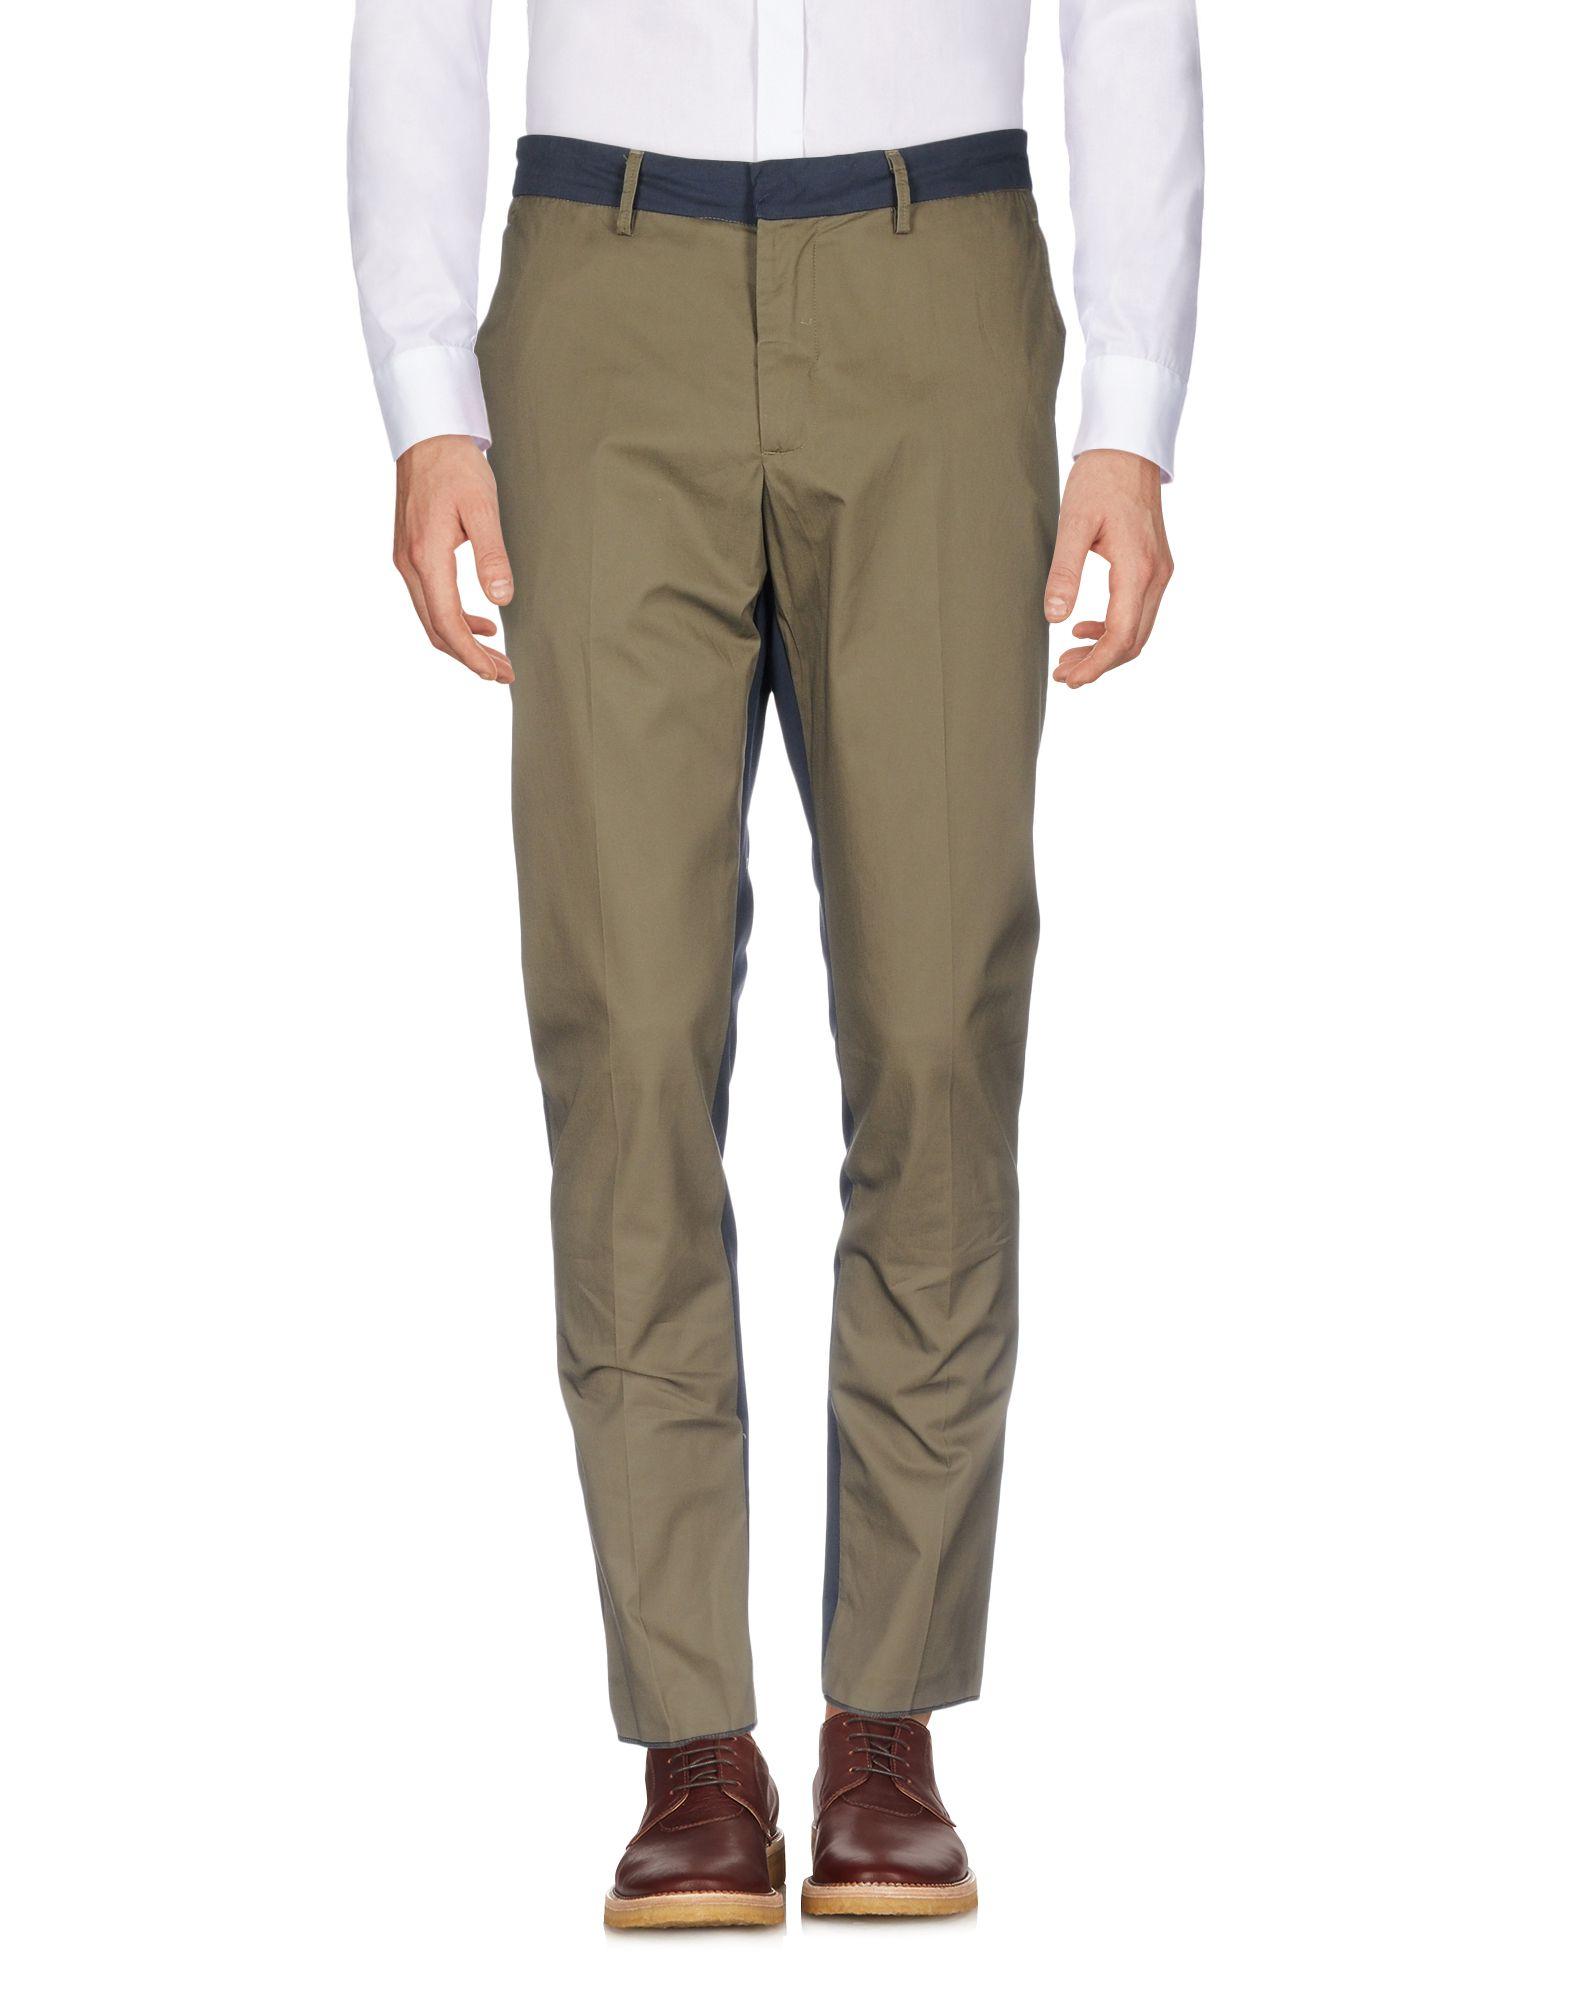 Pantalone The Editor Uomo 13138359GG - 13138359GG Uomo 918841